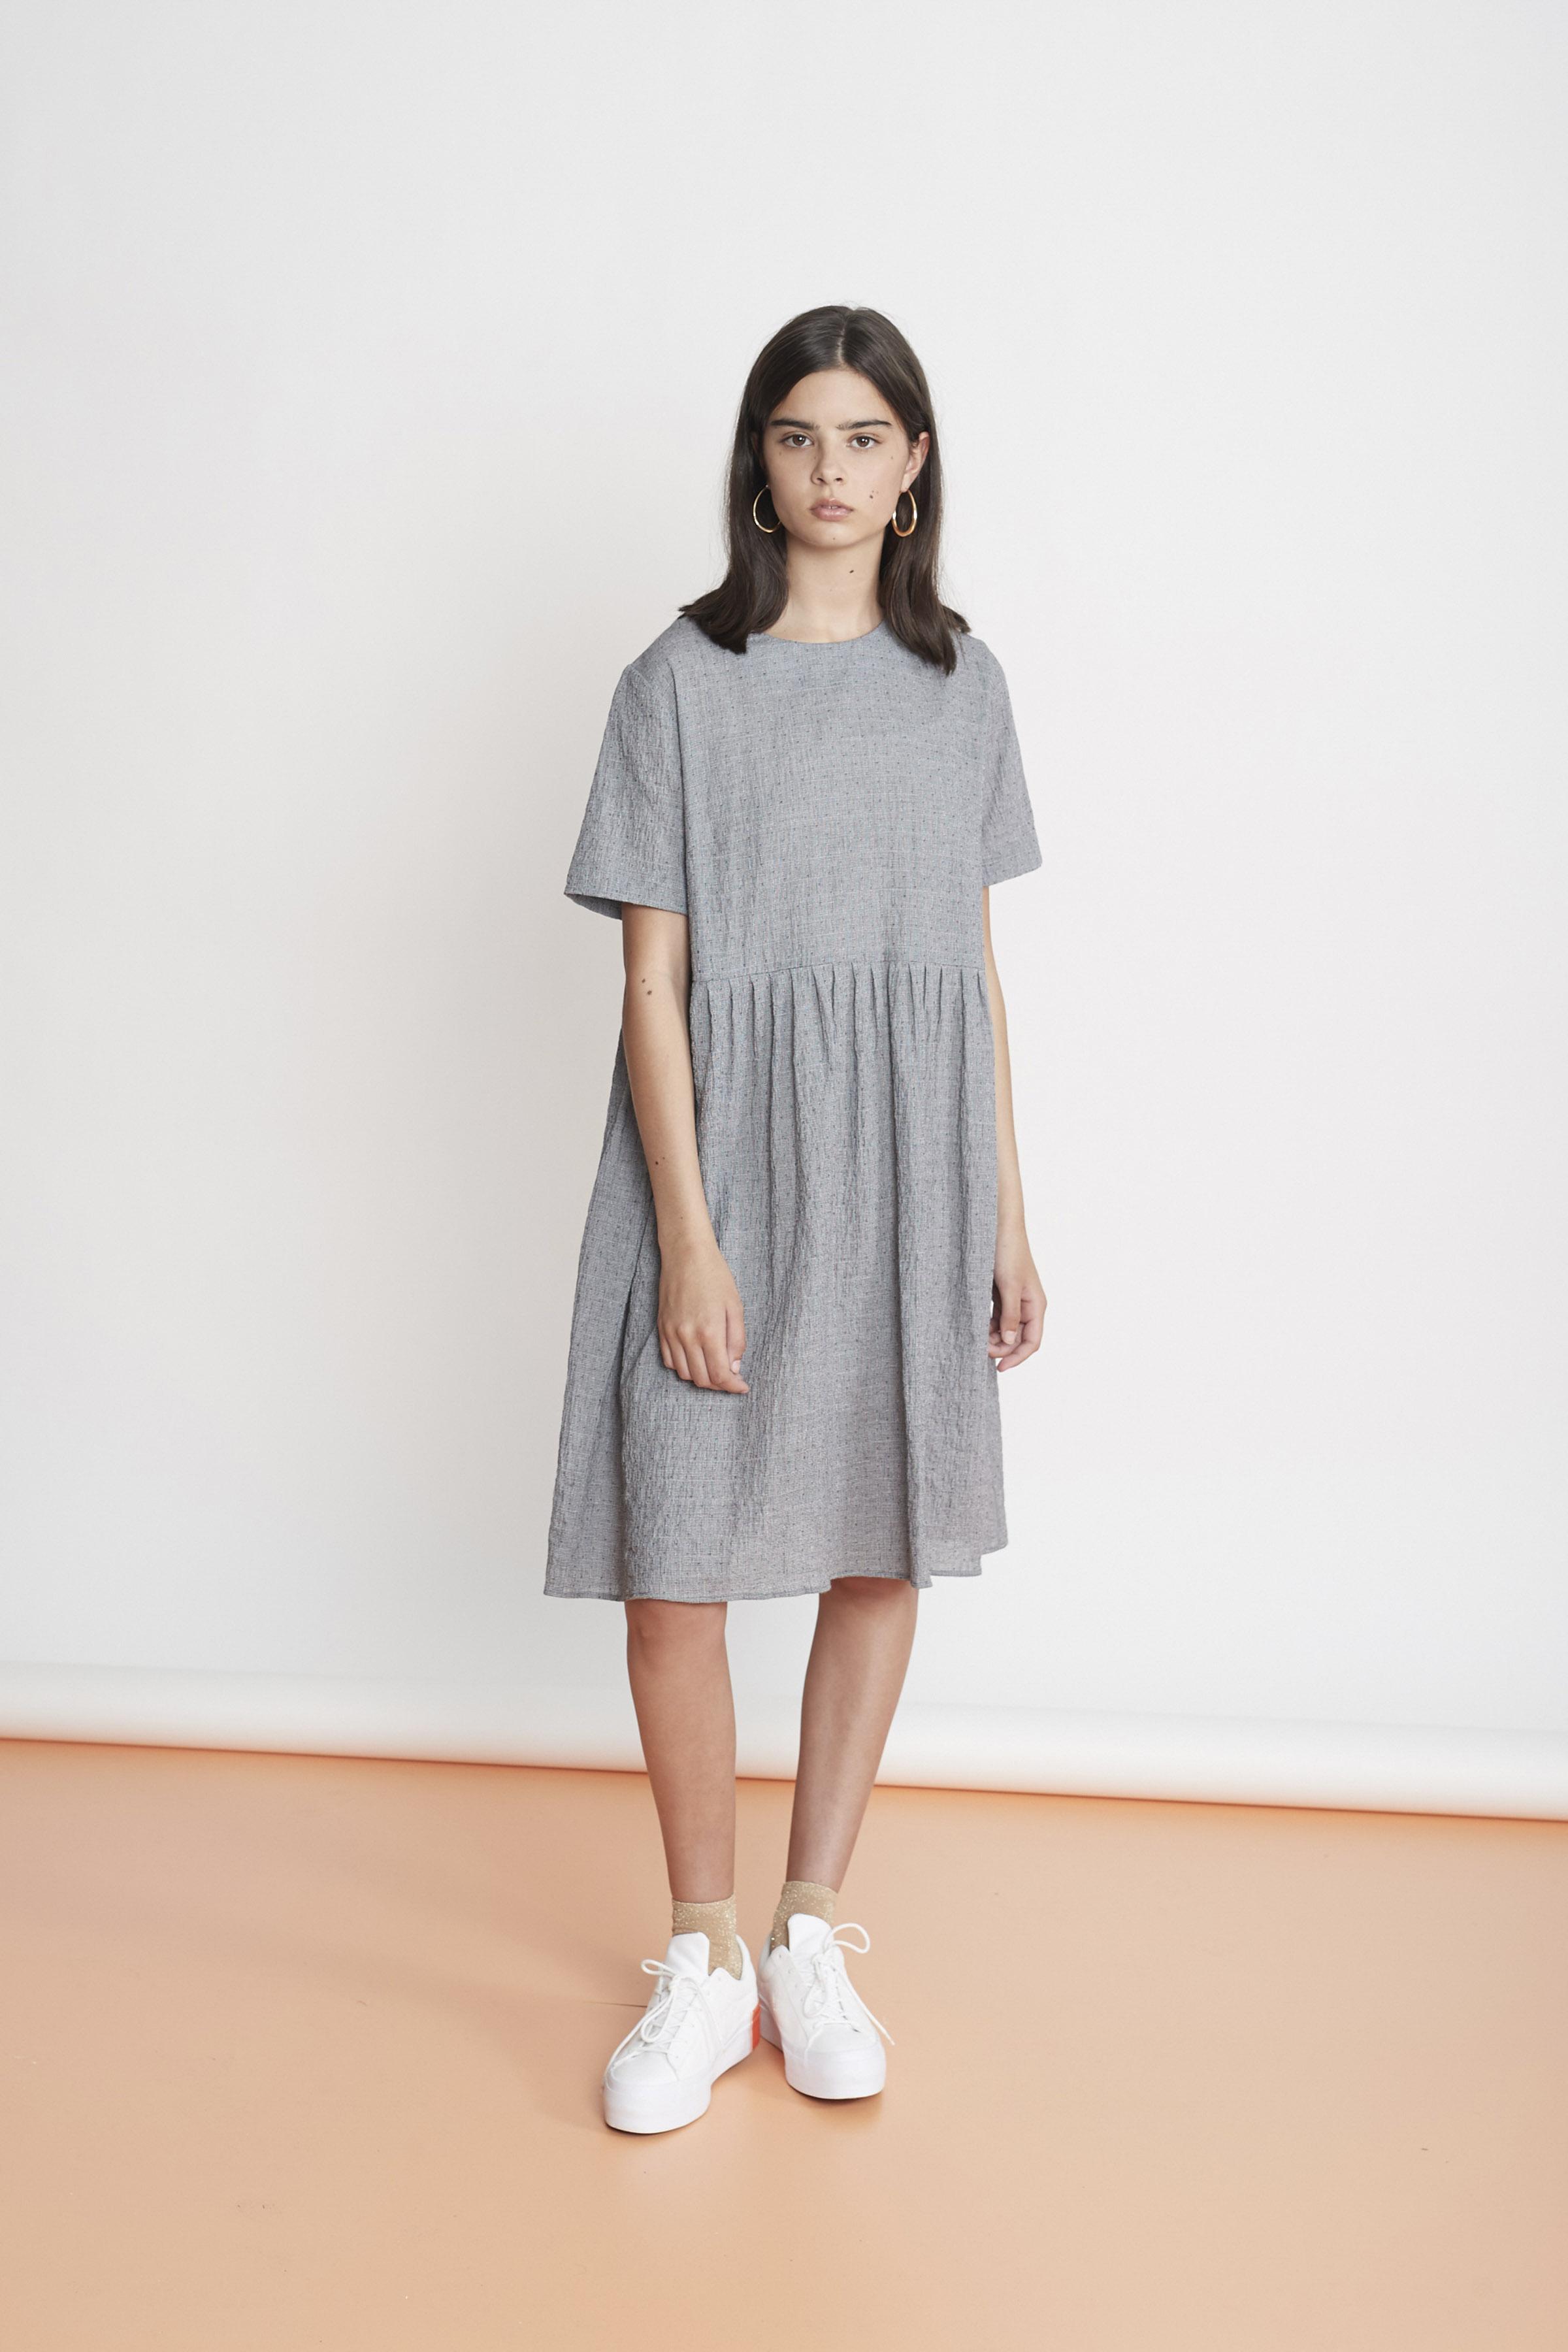 TSN_67. Clubhouse dress